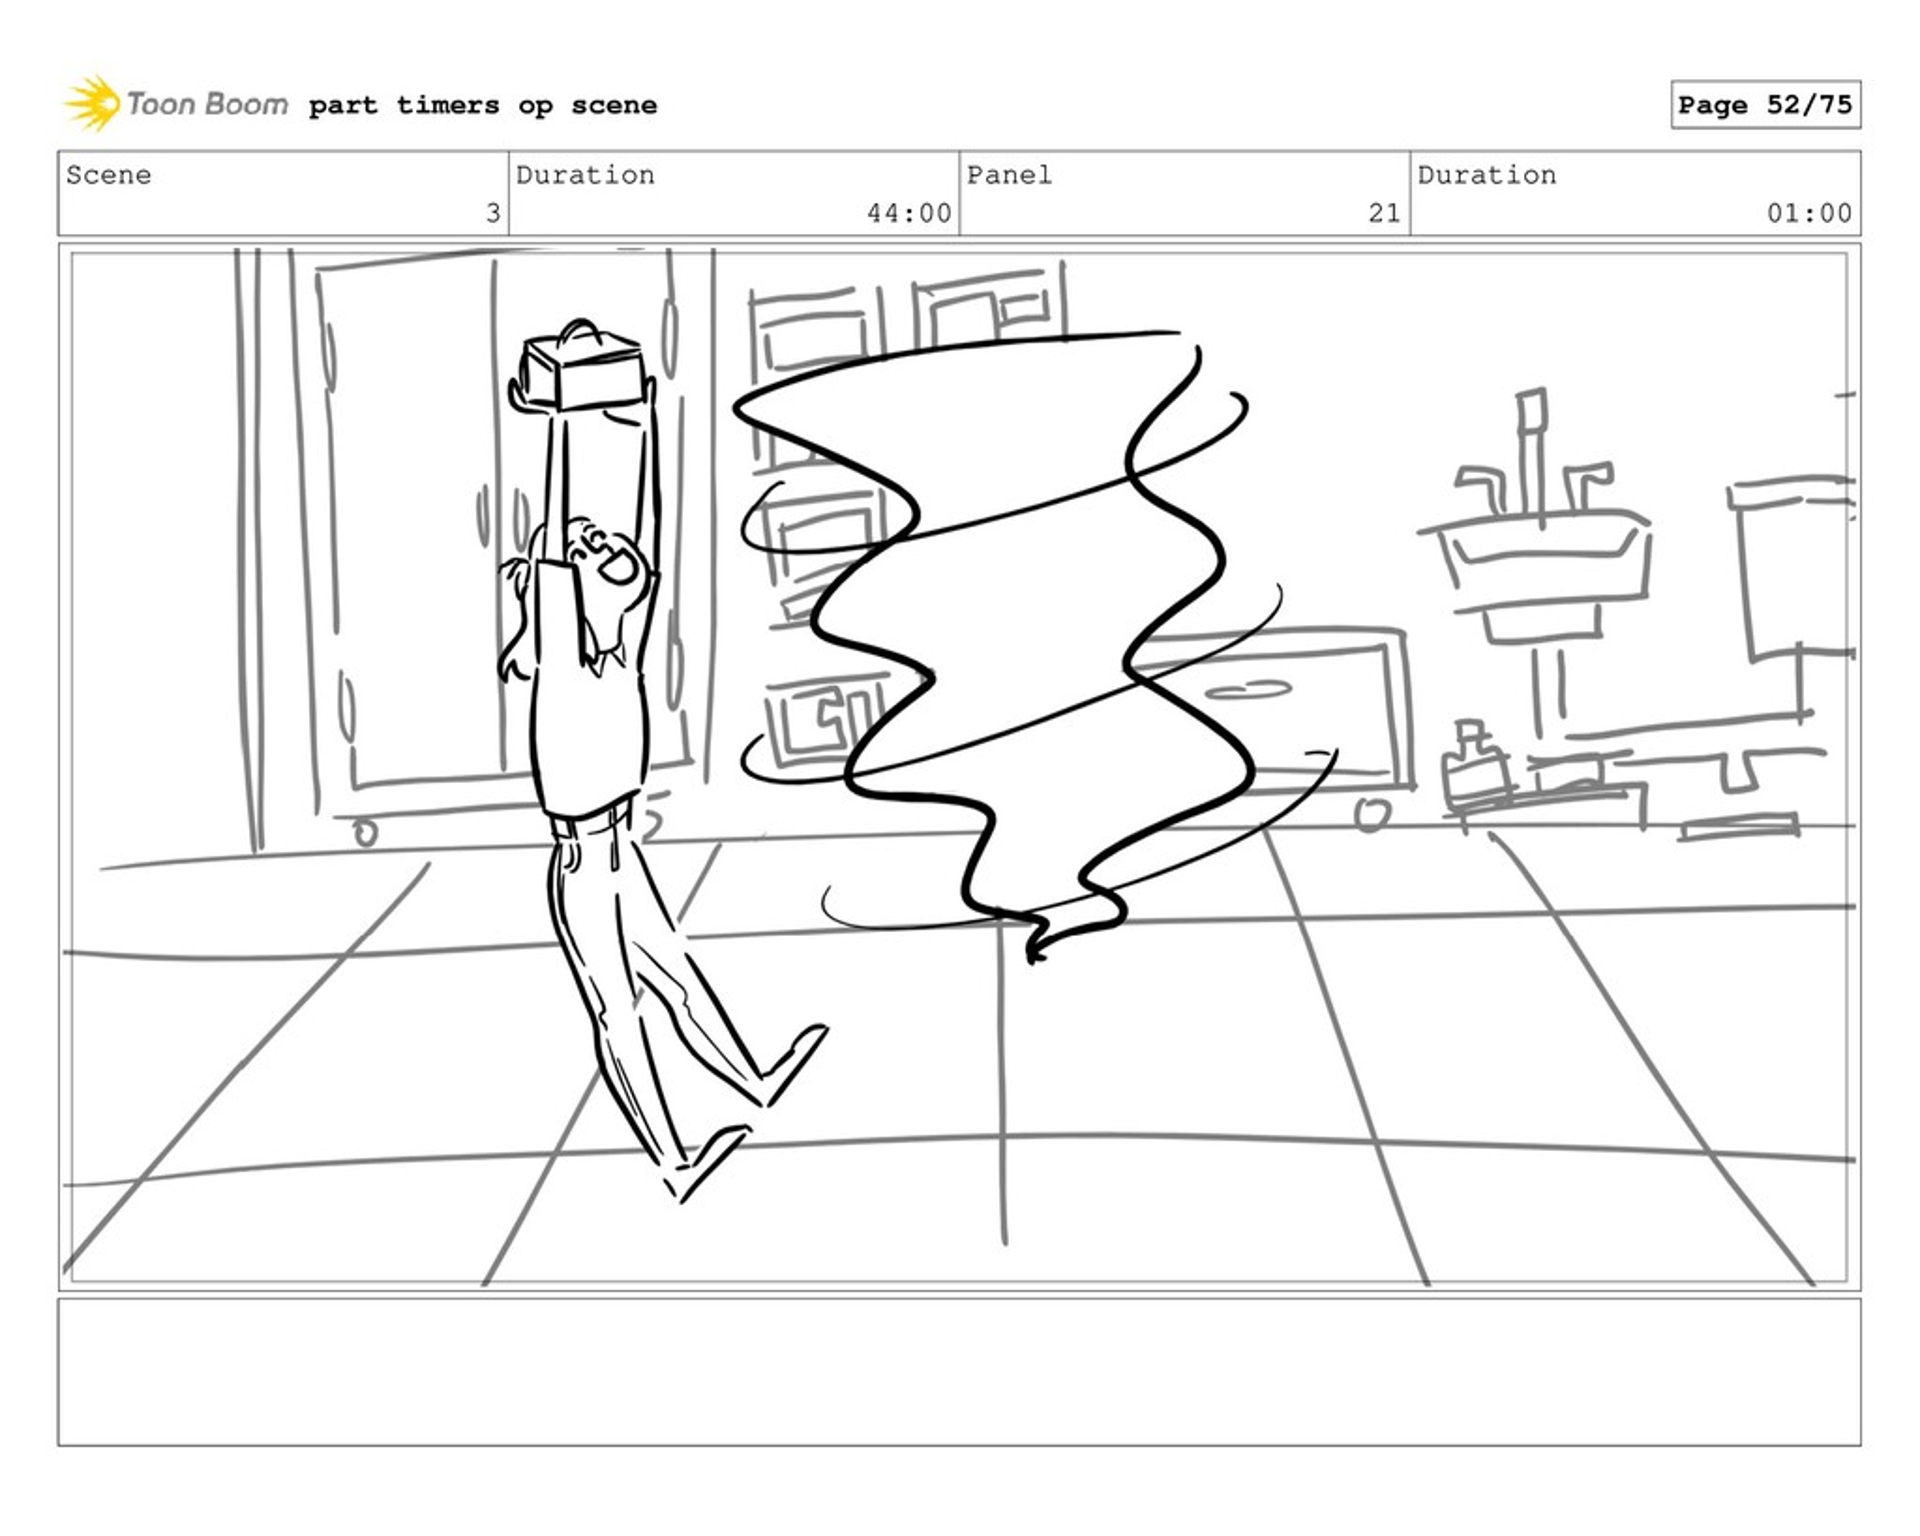 Scene 3 Duration 44:00 Panel 21 Duration 01:00 ...